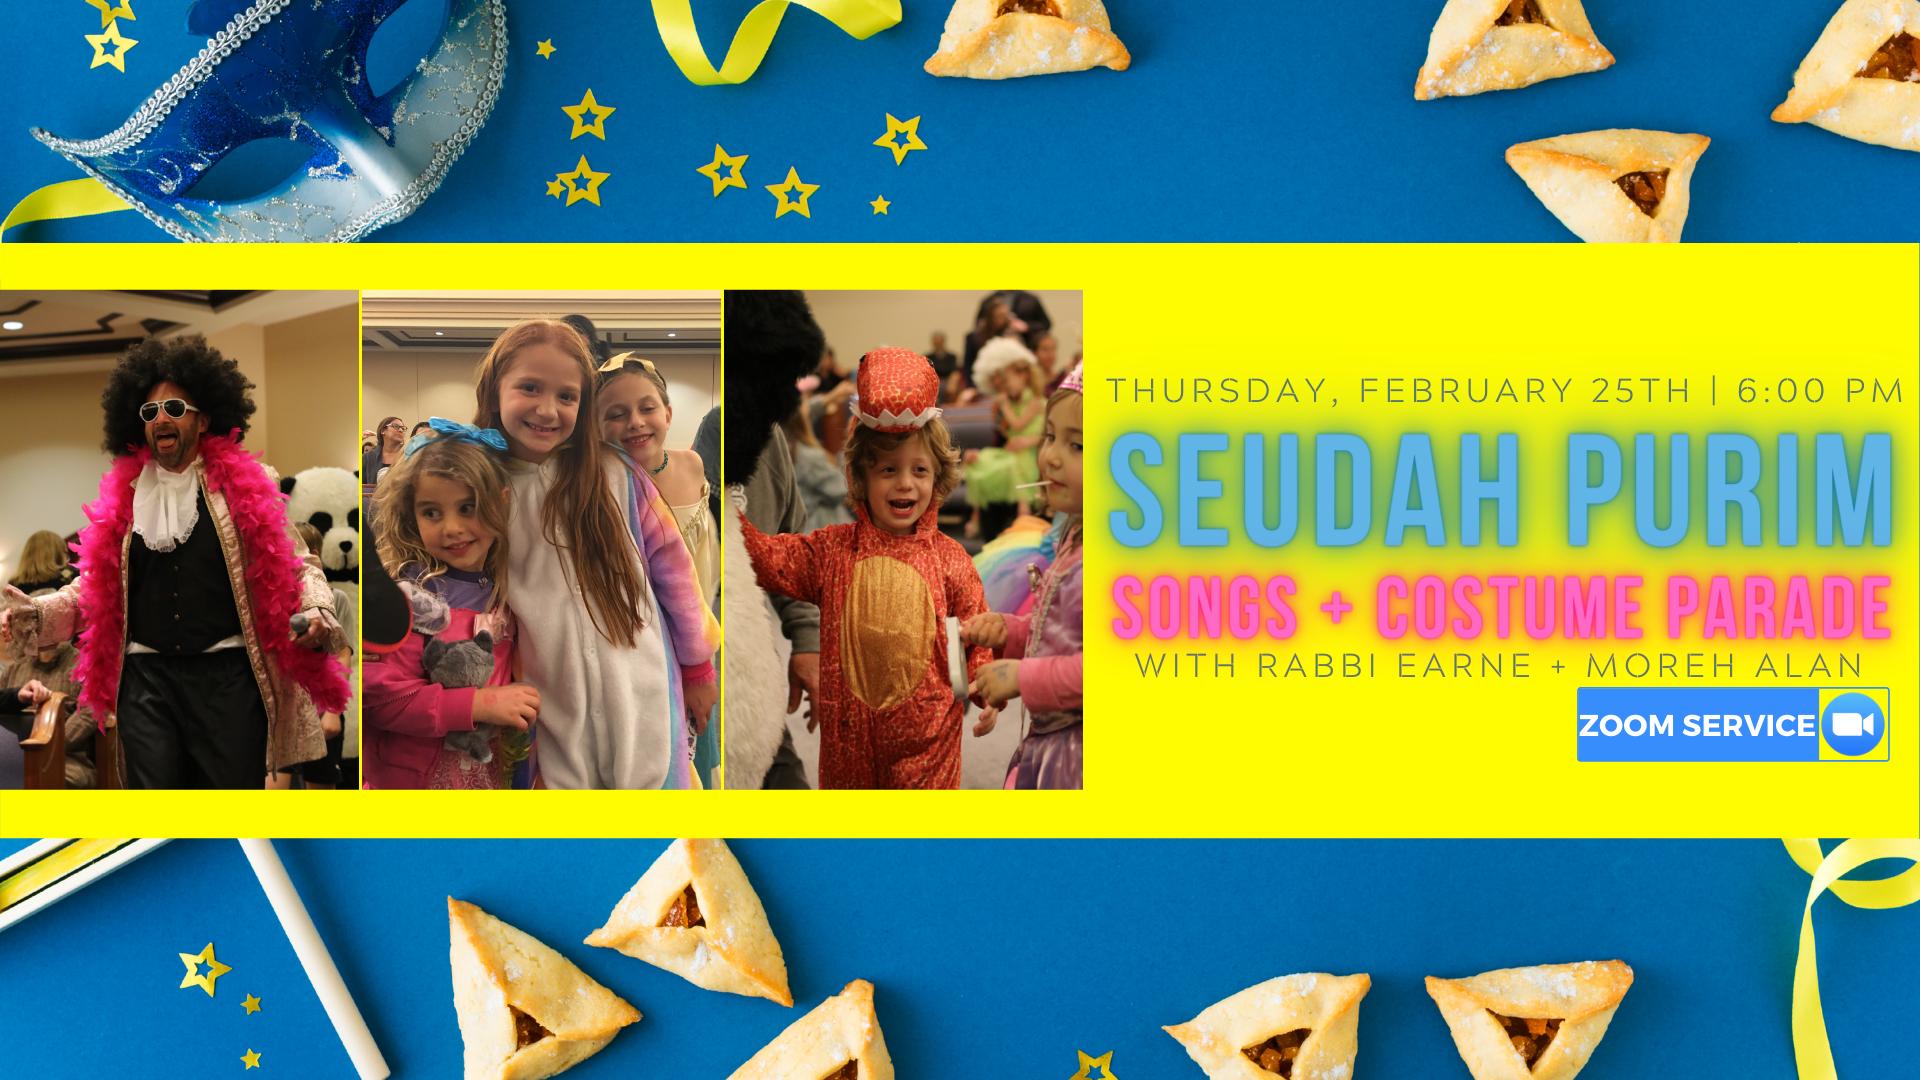 Banner Image for Purim Seudah, Songs & Parade